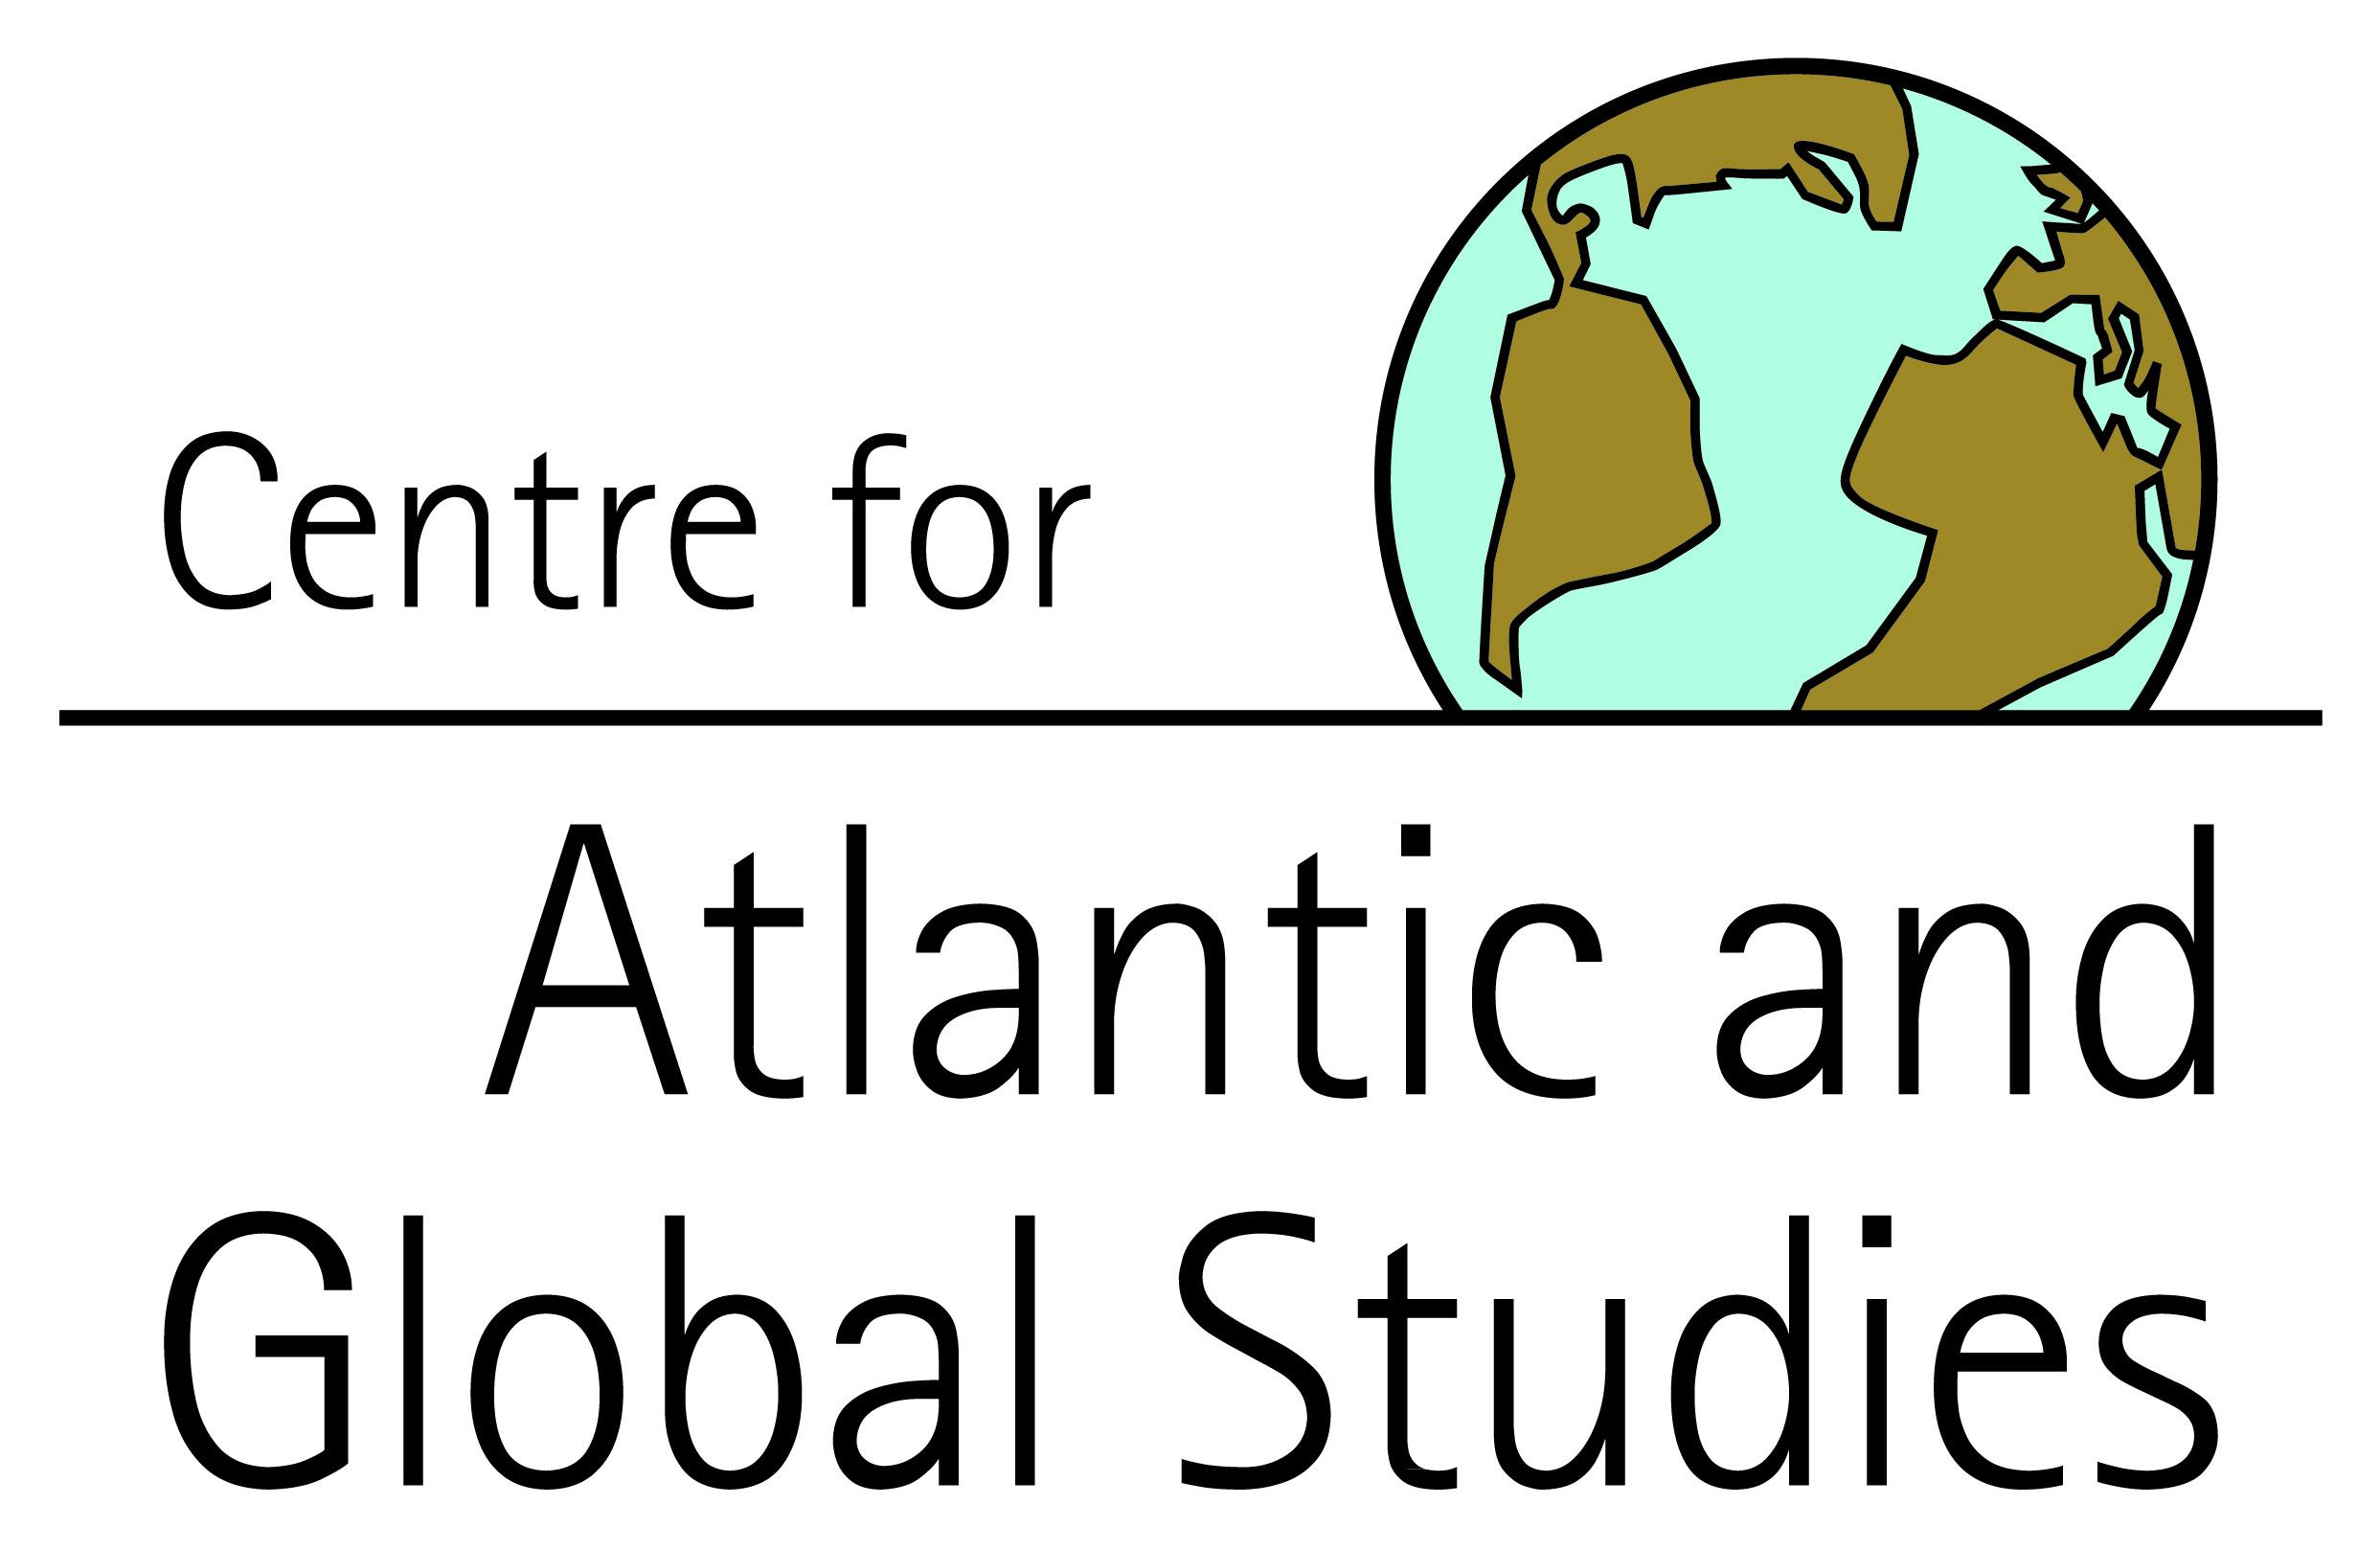 Centre for Atlantic and Global Studies (CAGS), Leibniz Universität Hannover